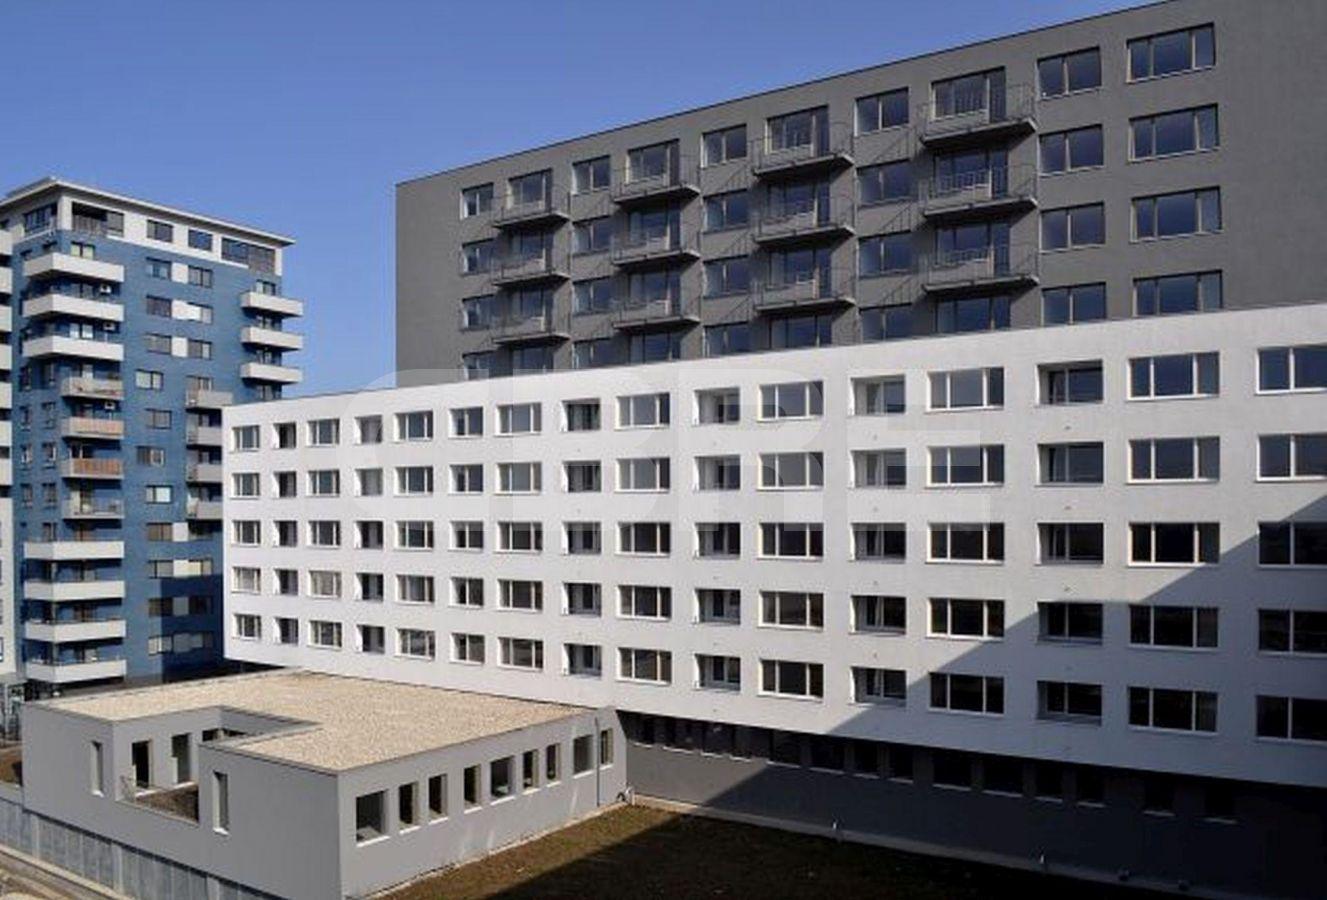 Solar, Bratislava - Petržalka | Offices for rent by CBRE | 2